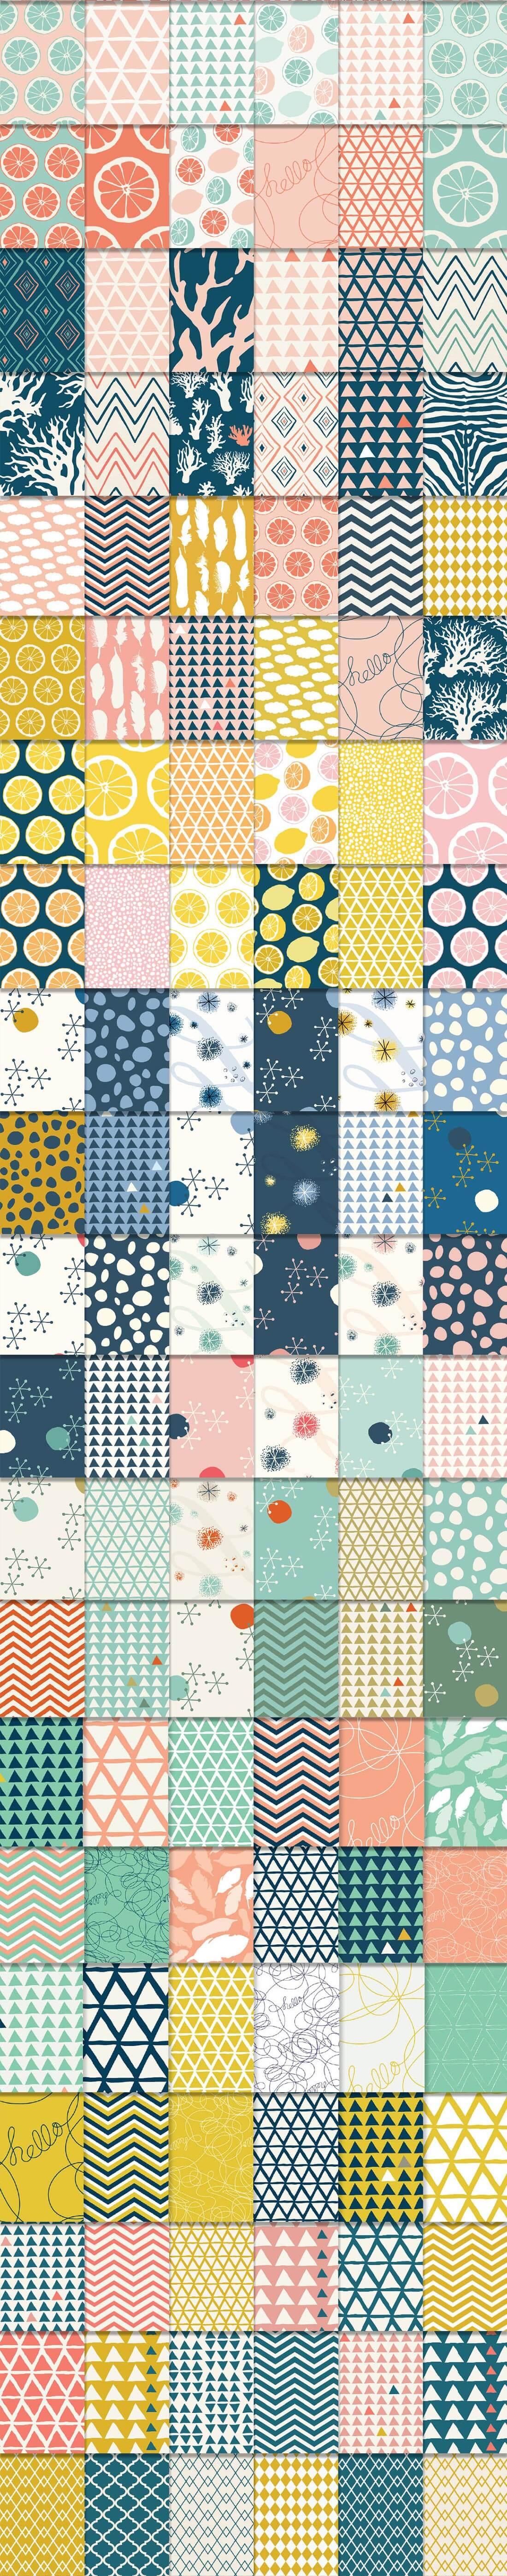 540 Geometric Patterns Super Bundle from Blixa 6 Studios - Blixa6Studios 5